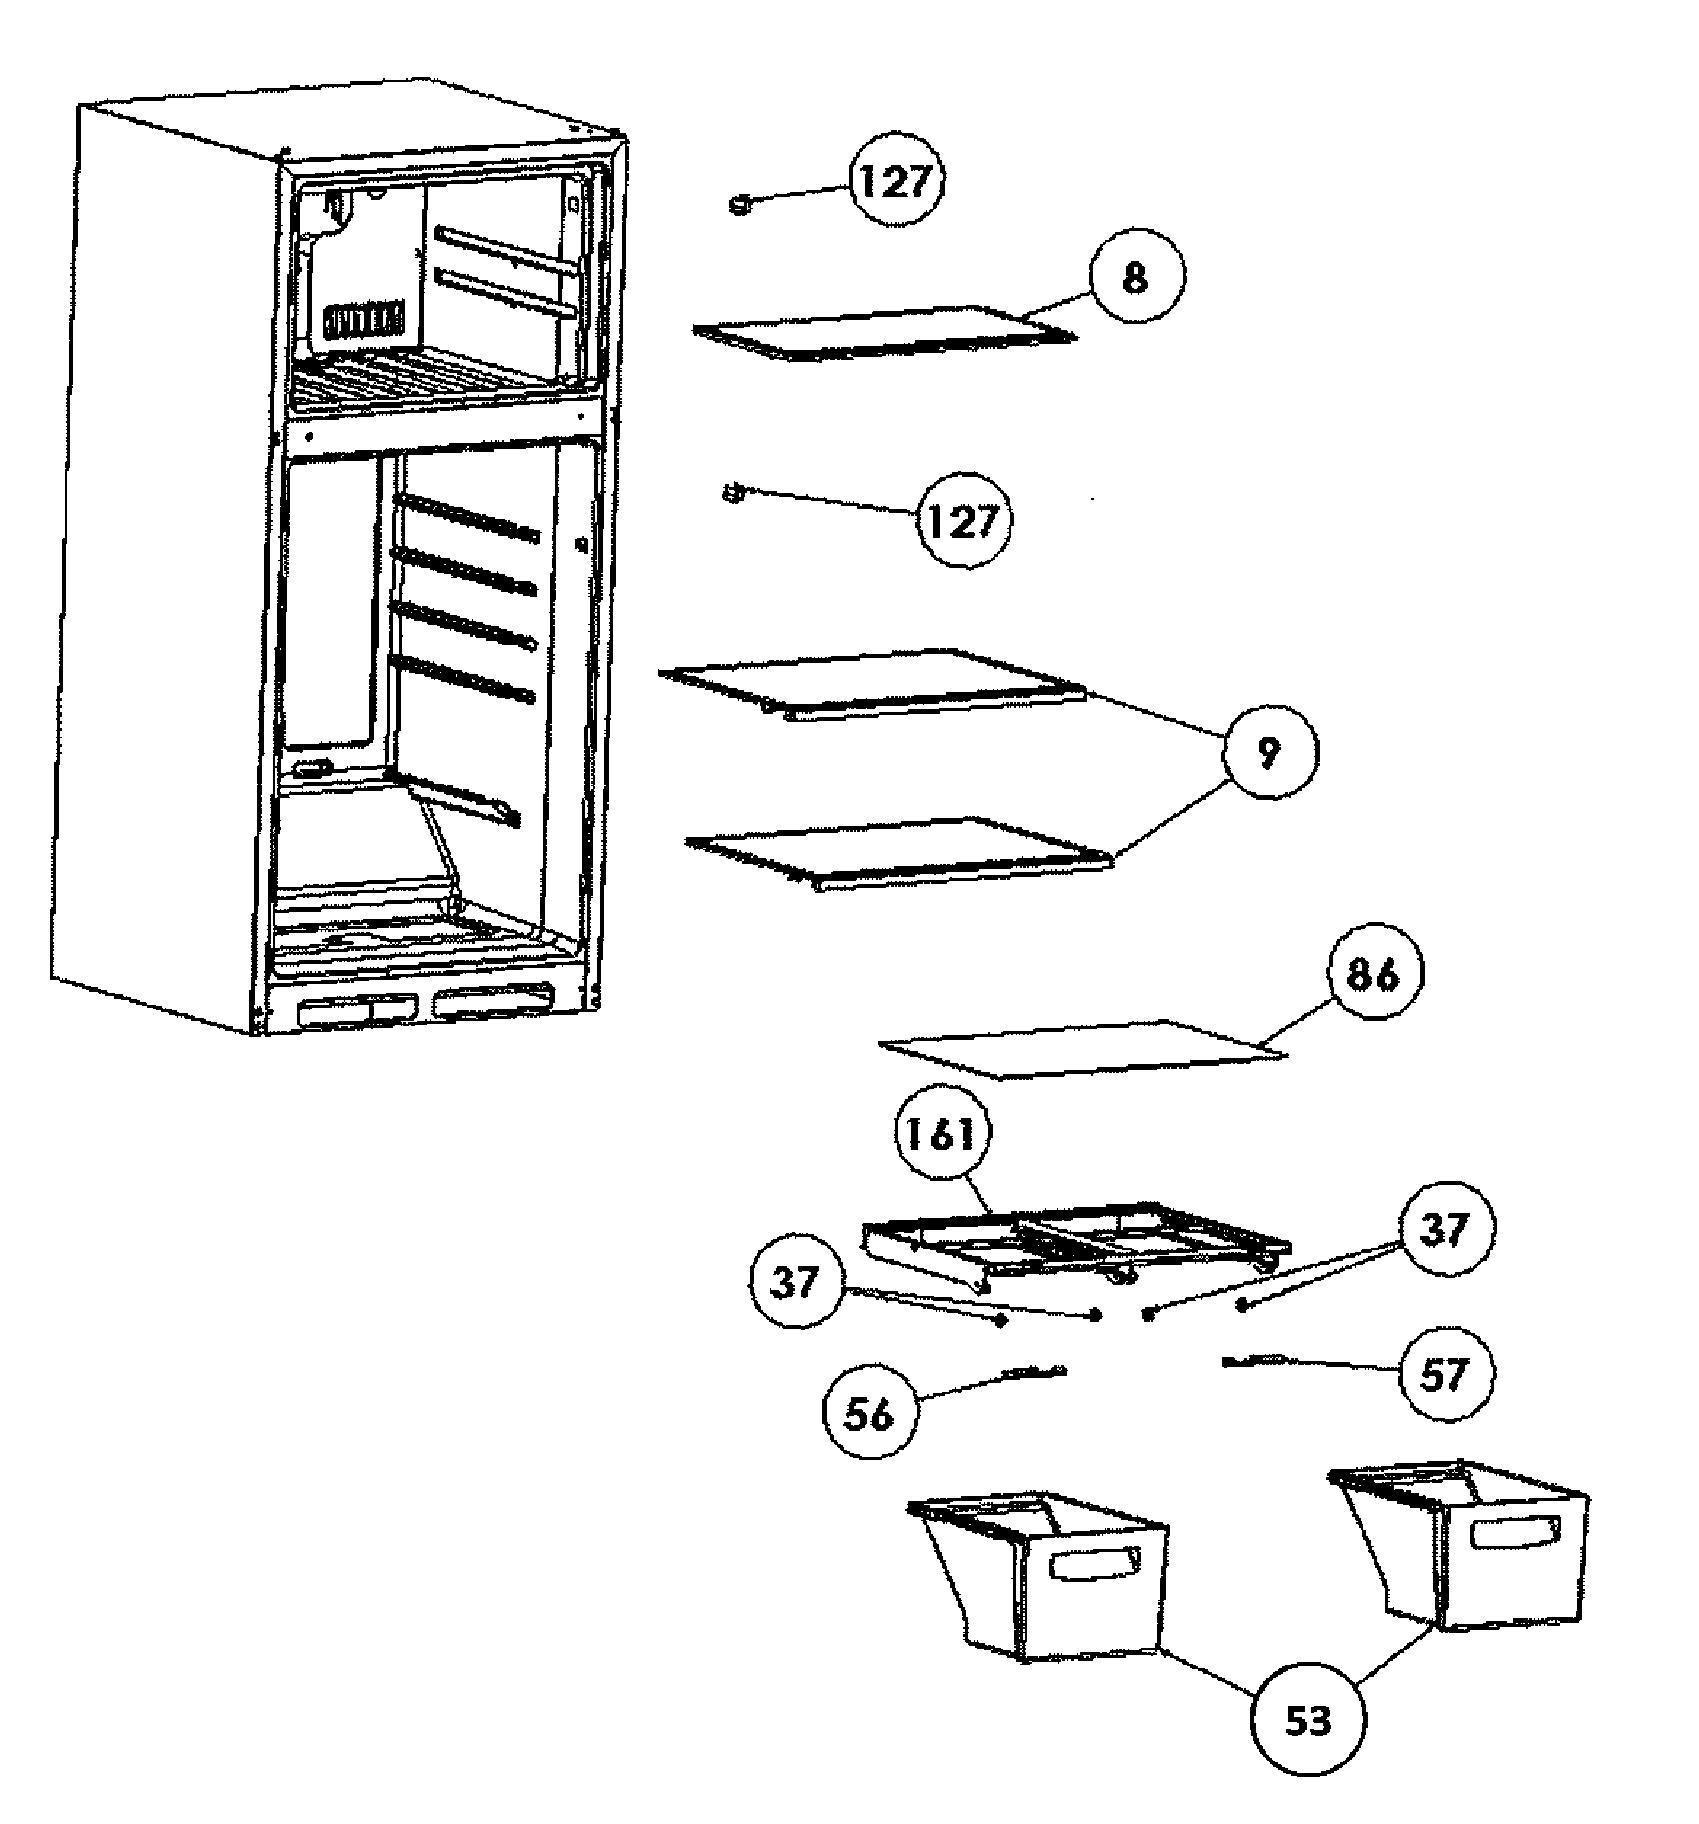 Haier model HRT18R1AWB top-mount refrigerator genuine parts